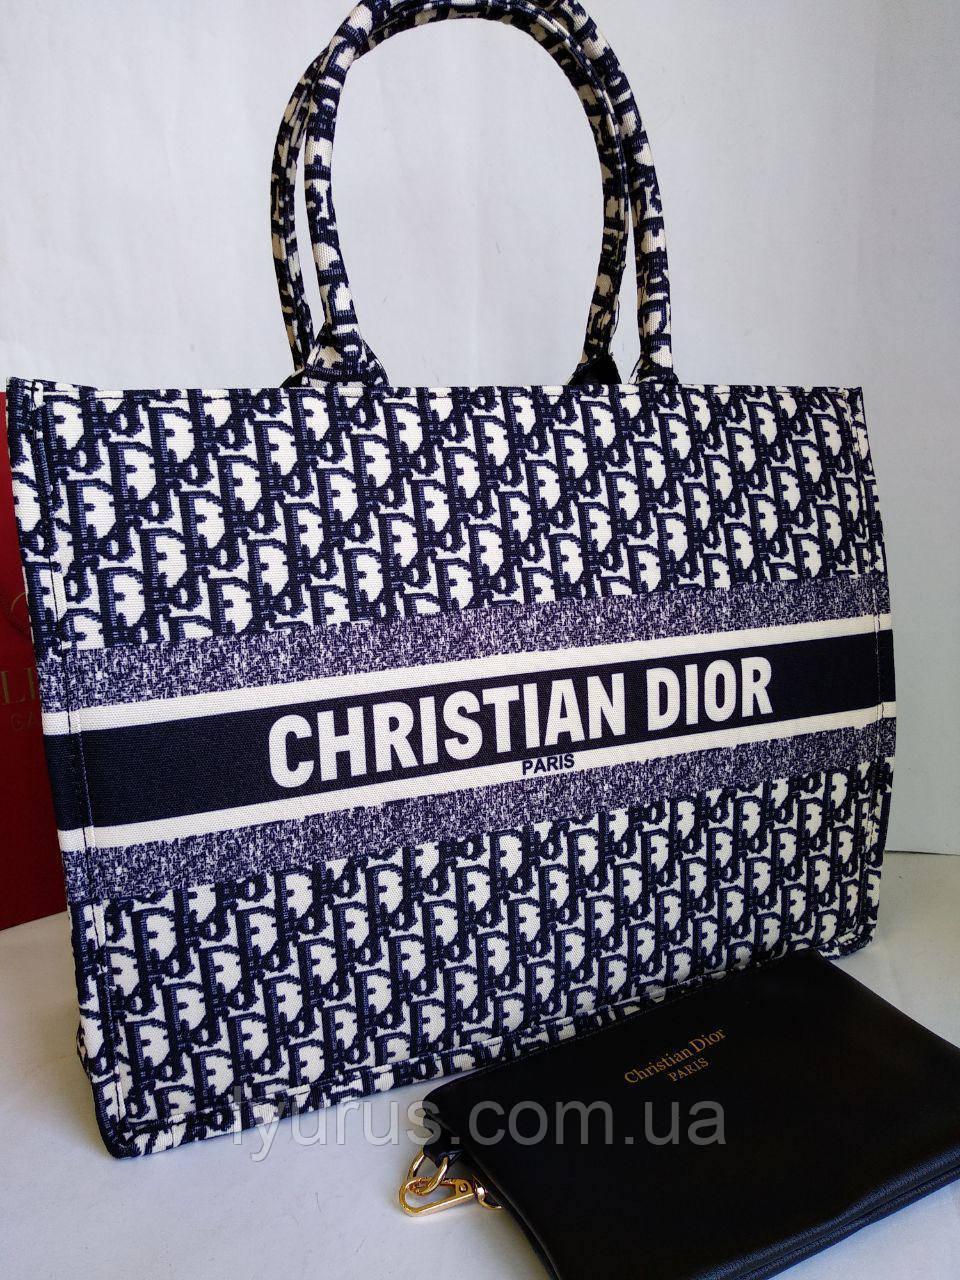 ab8b96d7b1bc Женская сумка в стиле Dior текстиль : продажа, цена в Полтаве ...